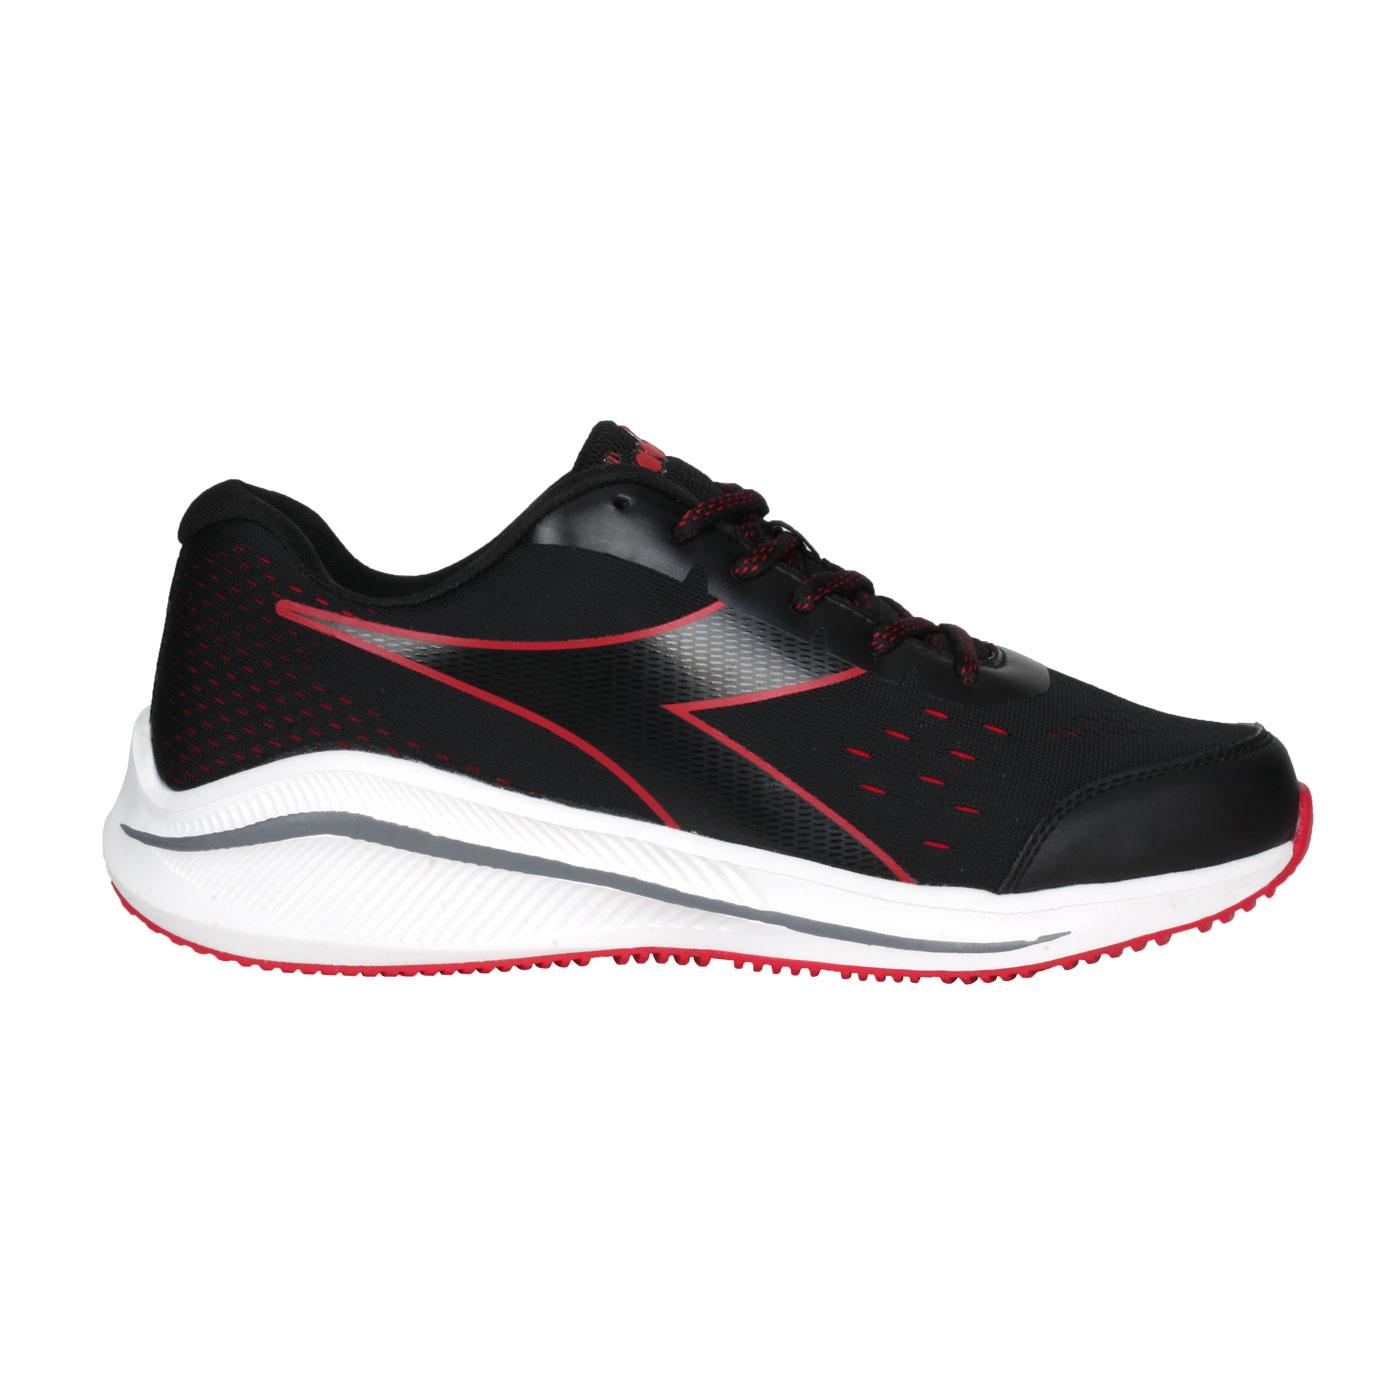 DIADORA 男款專業輕量慢跑鞋-E寬楦 DA71171 - 黑紅